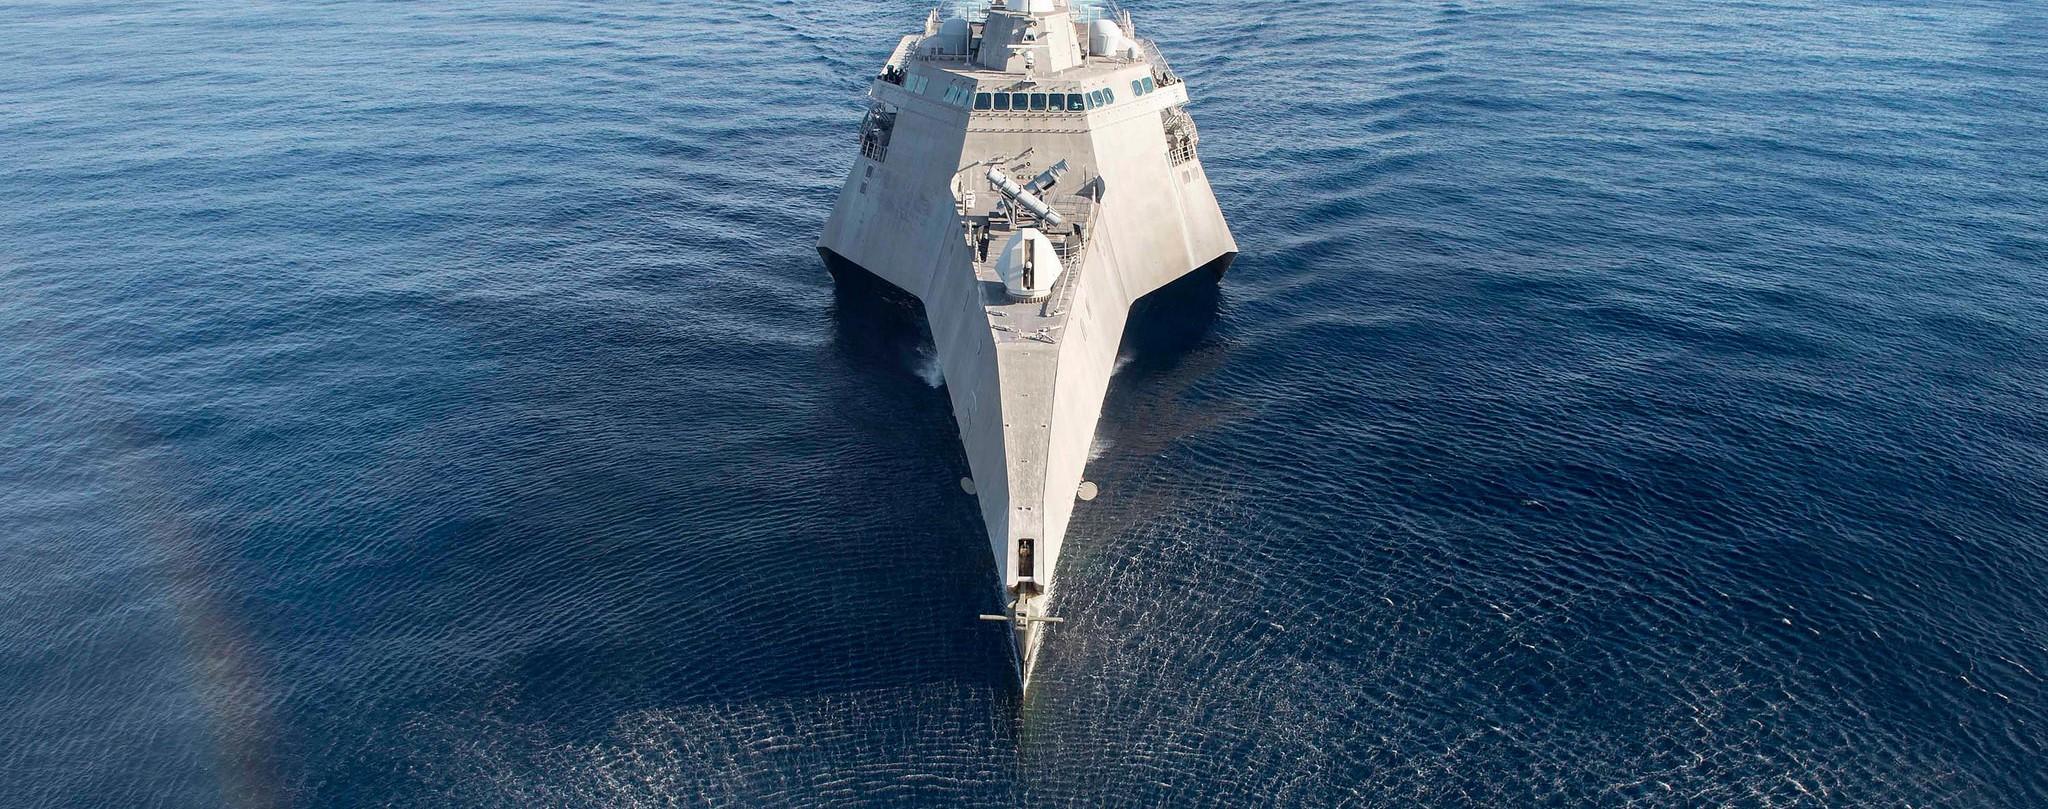 The USS Coronado the South China Sea, May 2017 (Photo: Flickr/US Pacific Fleet)